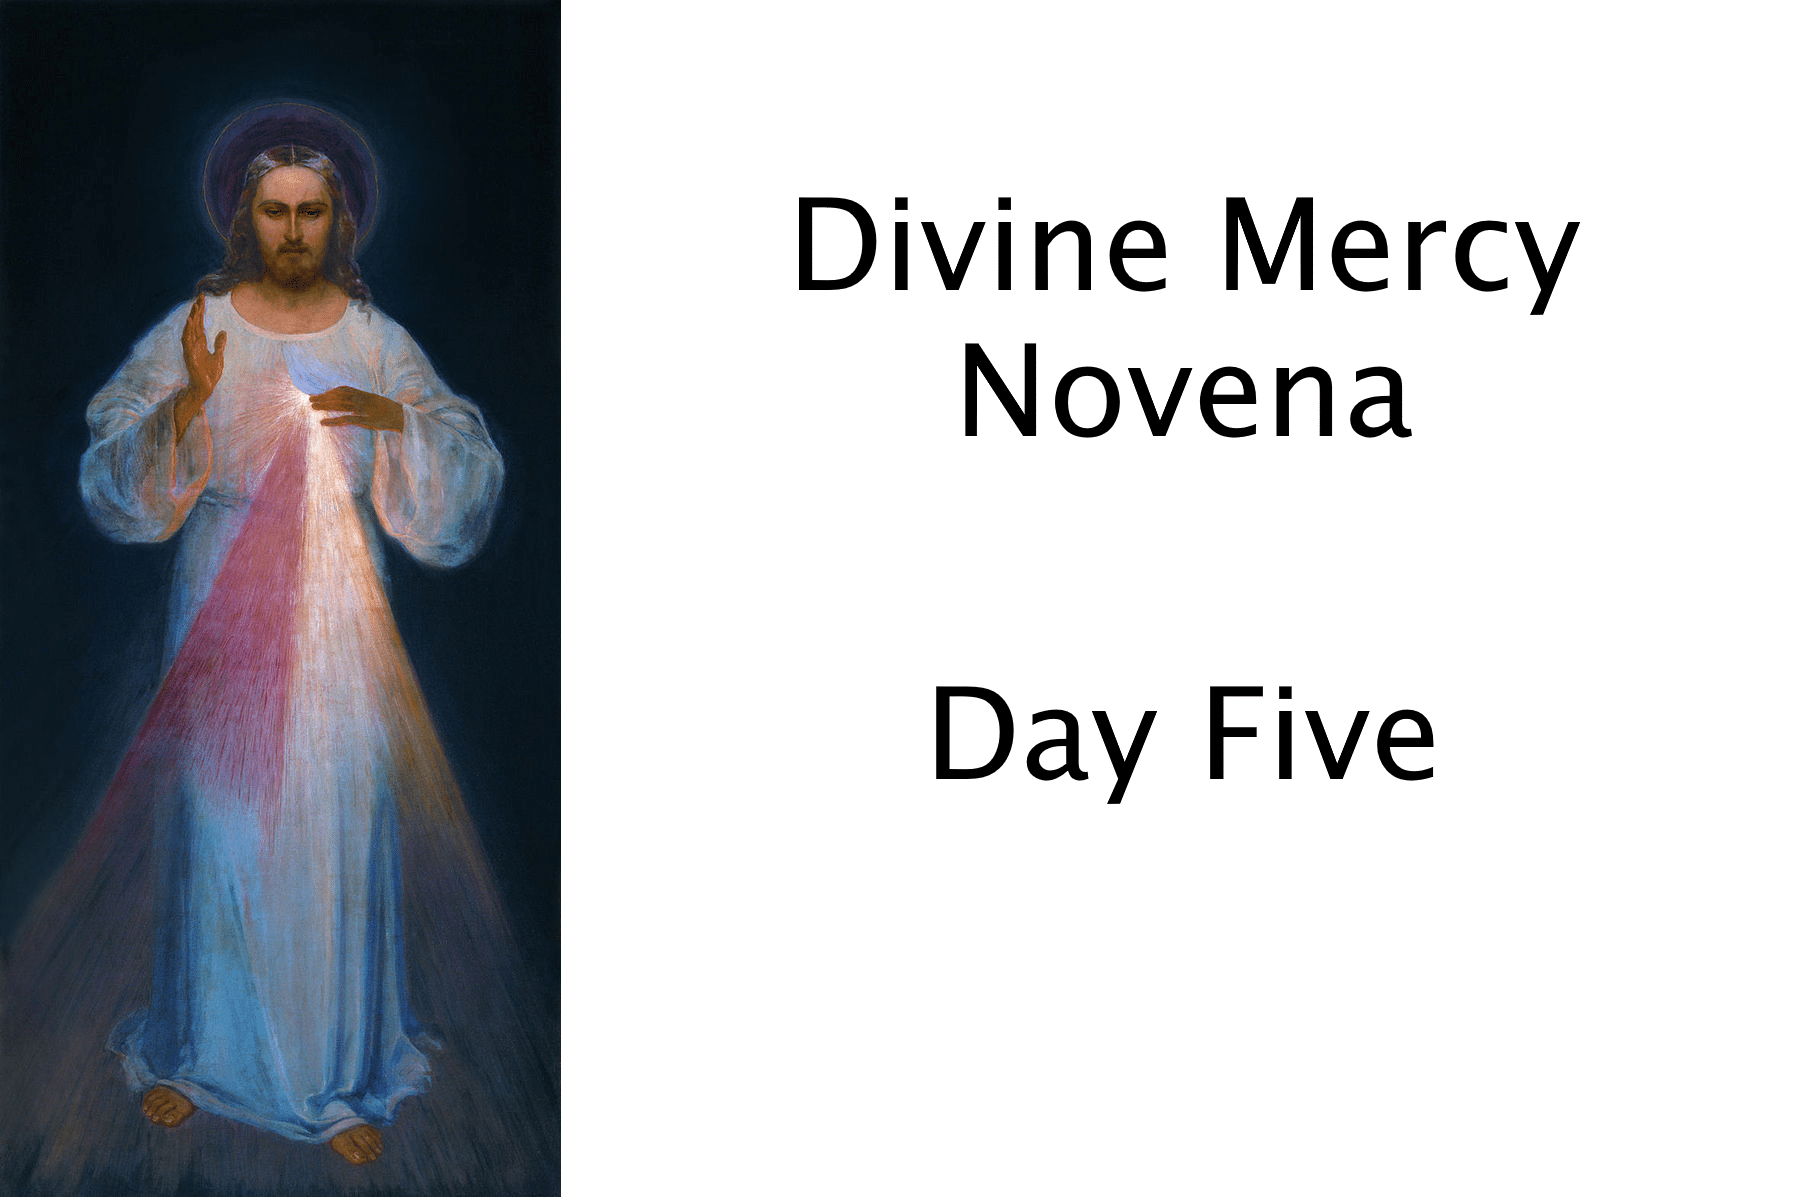 Divine Mercy Novena Day Five